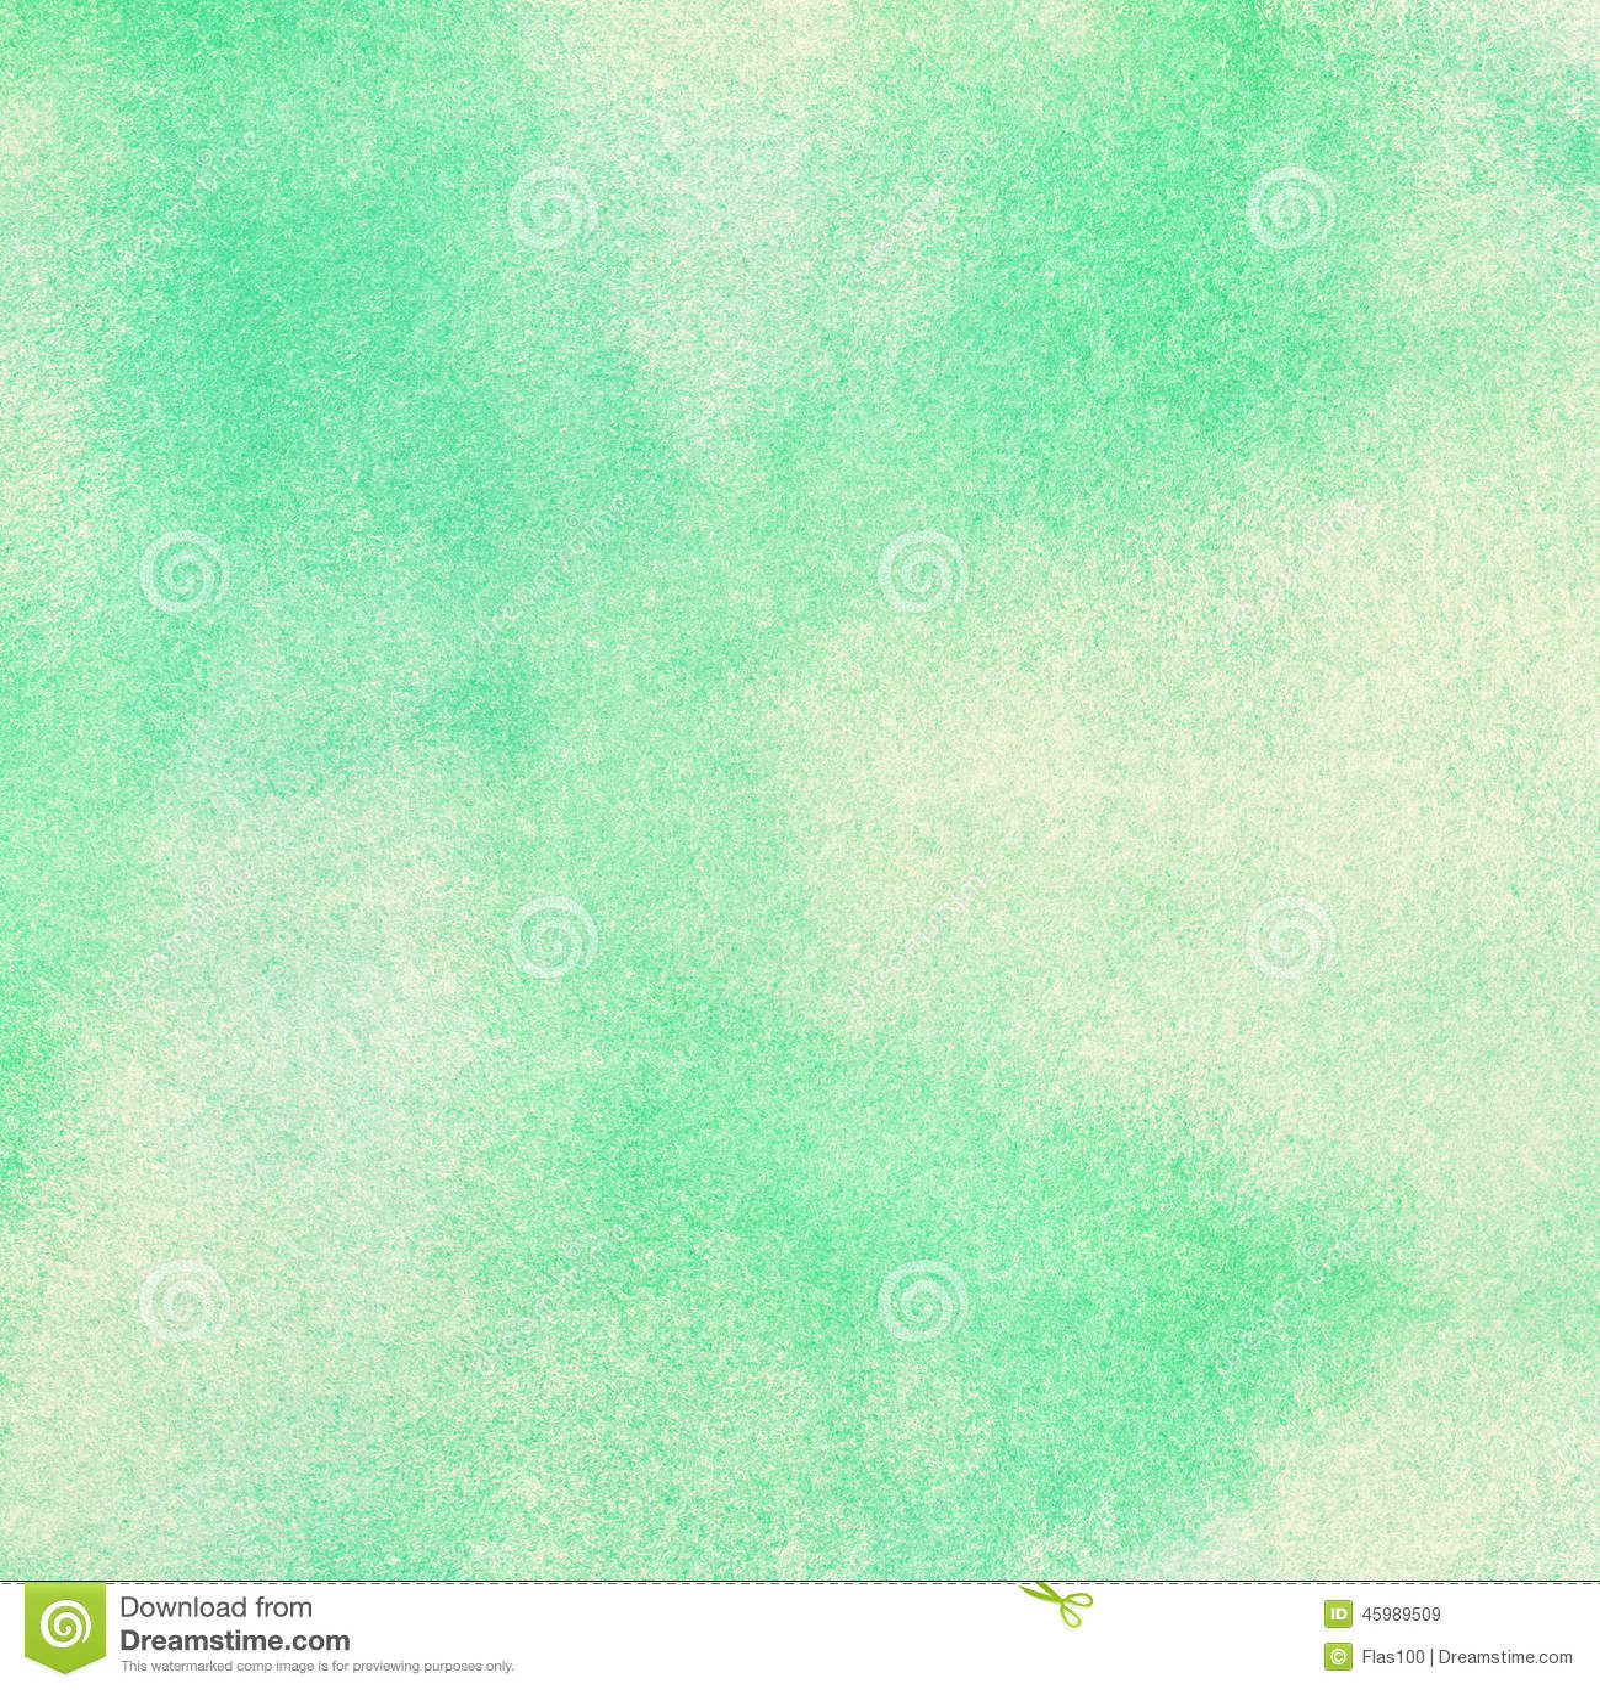 fond d 39 aquarelle de feu vert illustration stock illustration du configuration lumi re 45989509. Black Bedroom Furniture Sets. Home Design Ideas